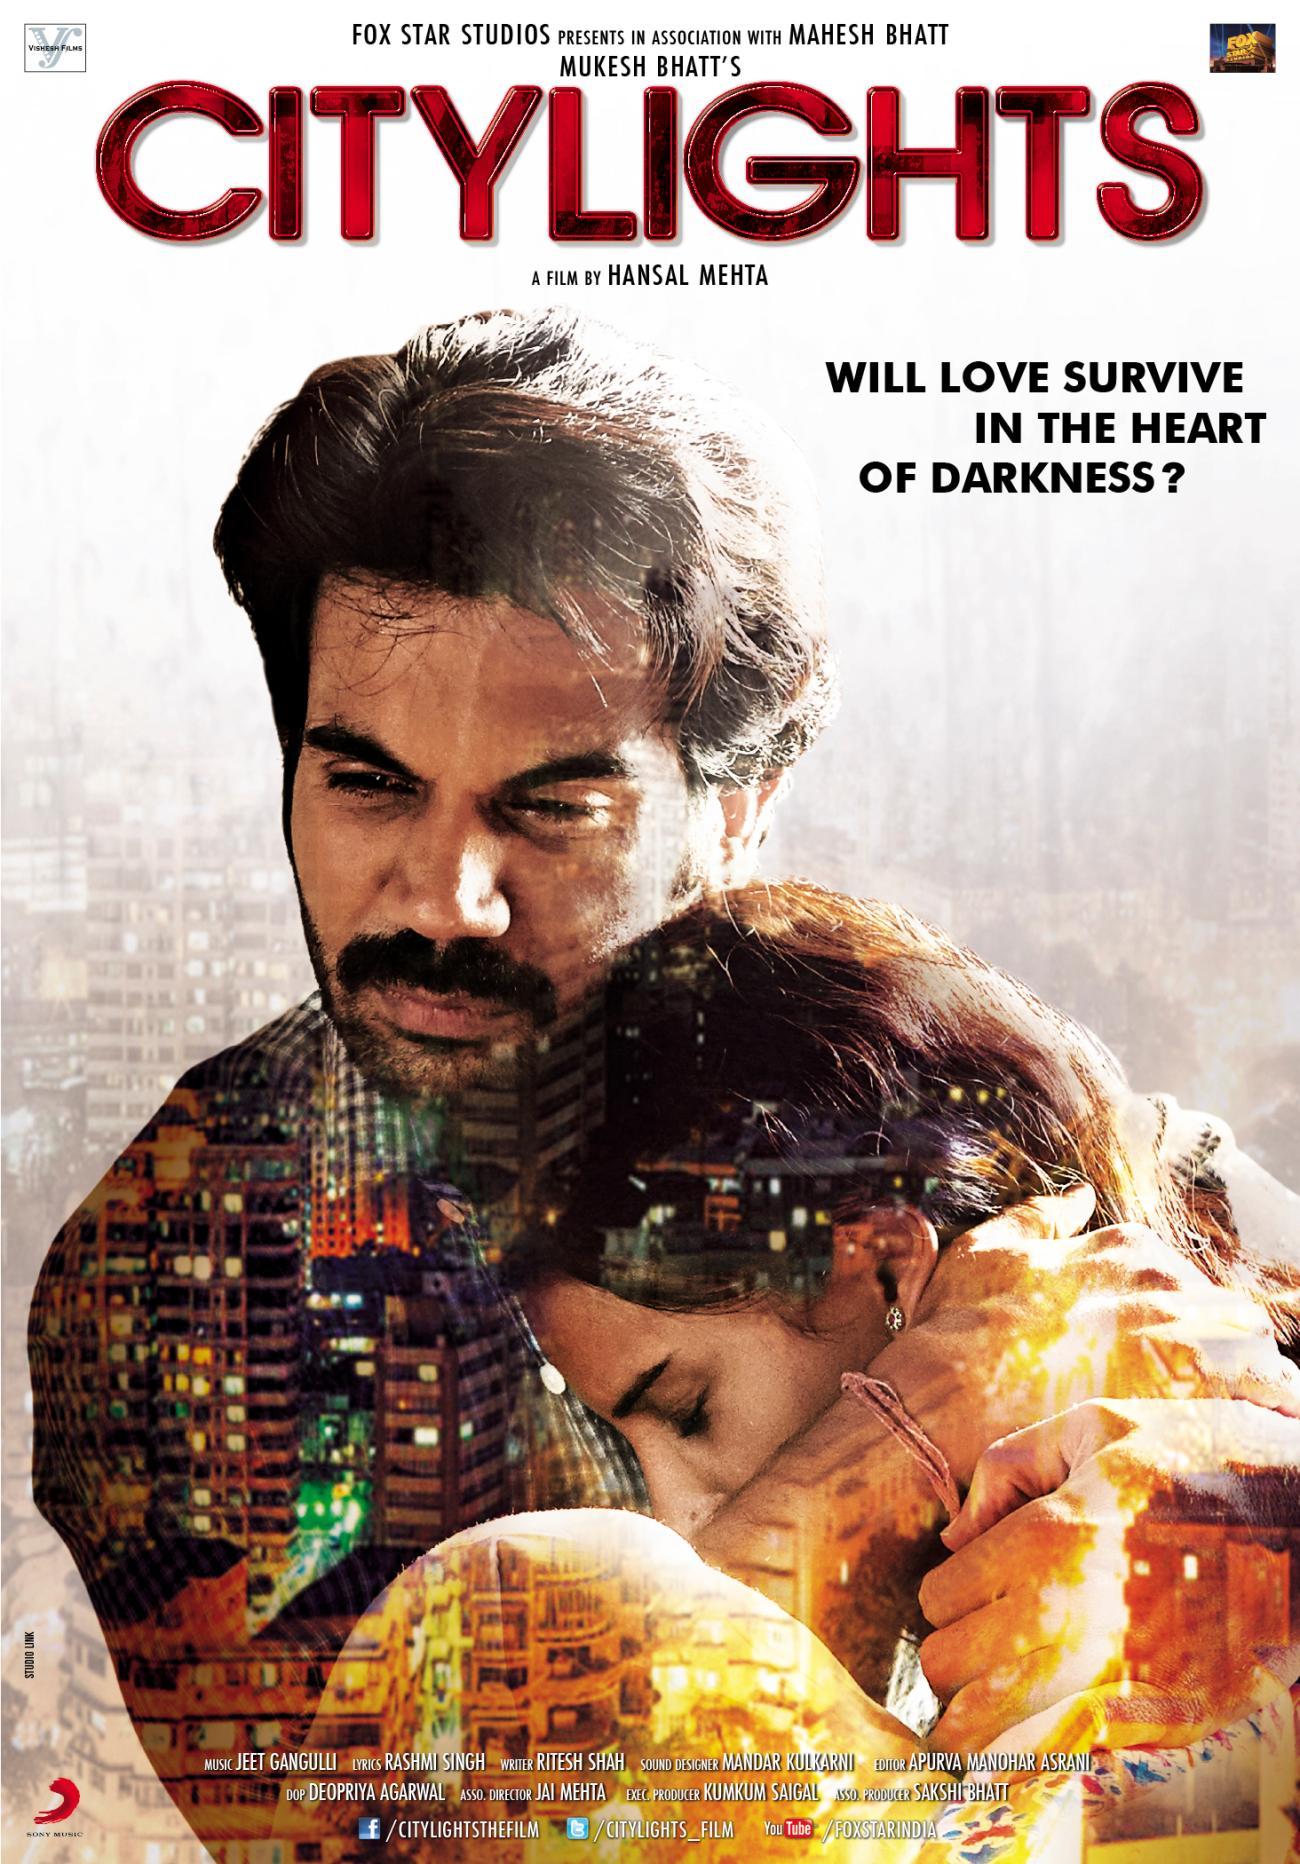 CityLights (2014) Hindi WEB-DL - 480P   720P - x264 - 300MB   1.1GB - Download & Watch Online  Movie Poster - mlsbd